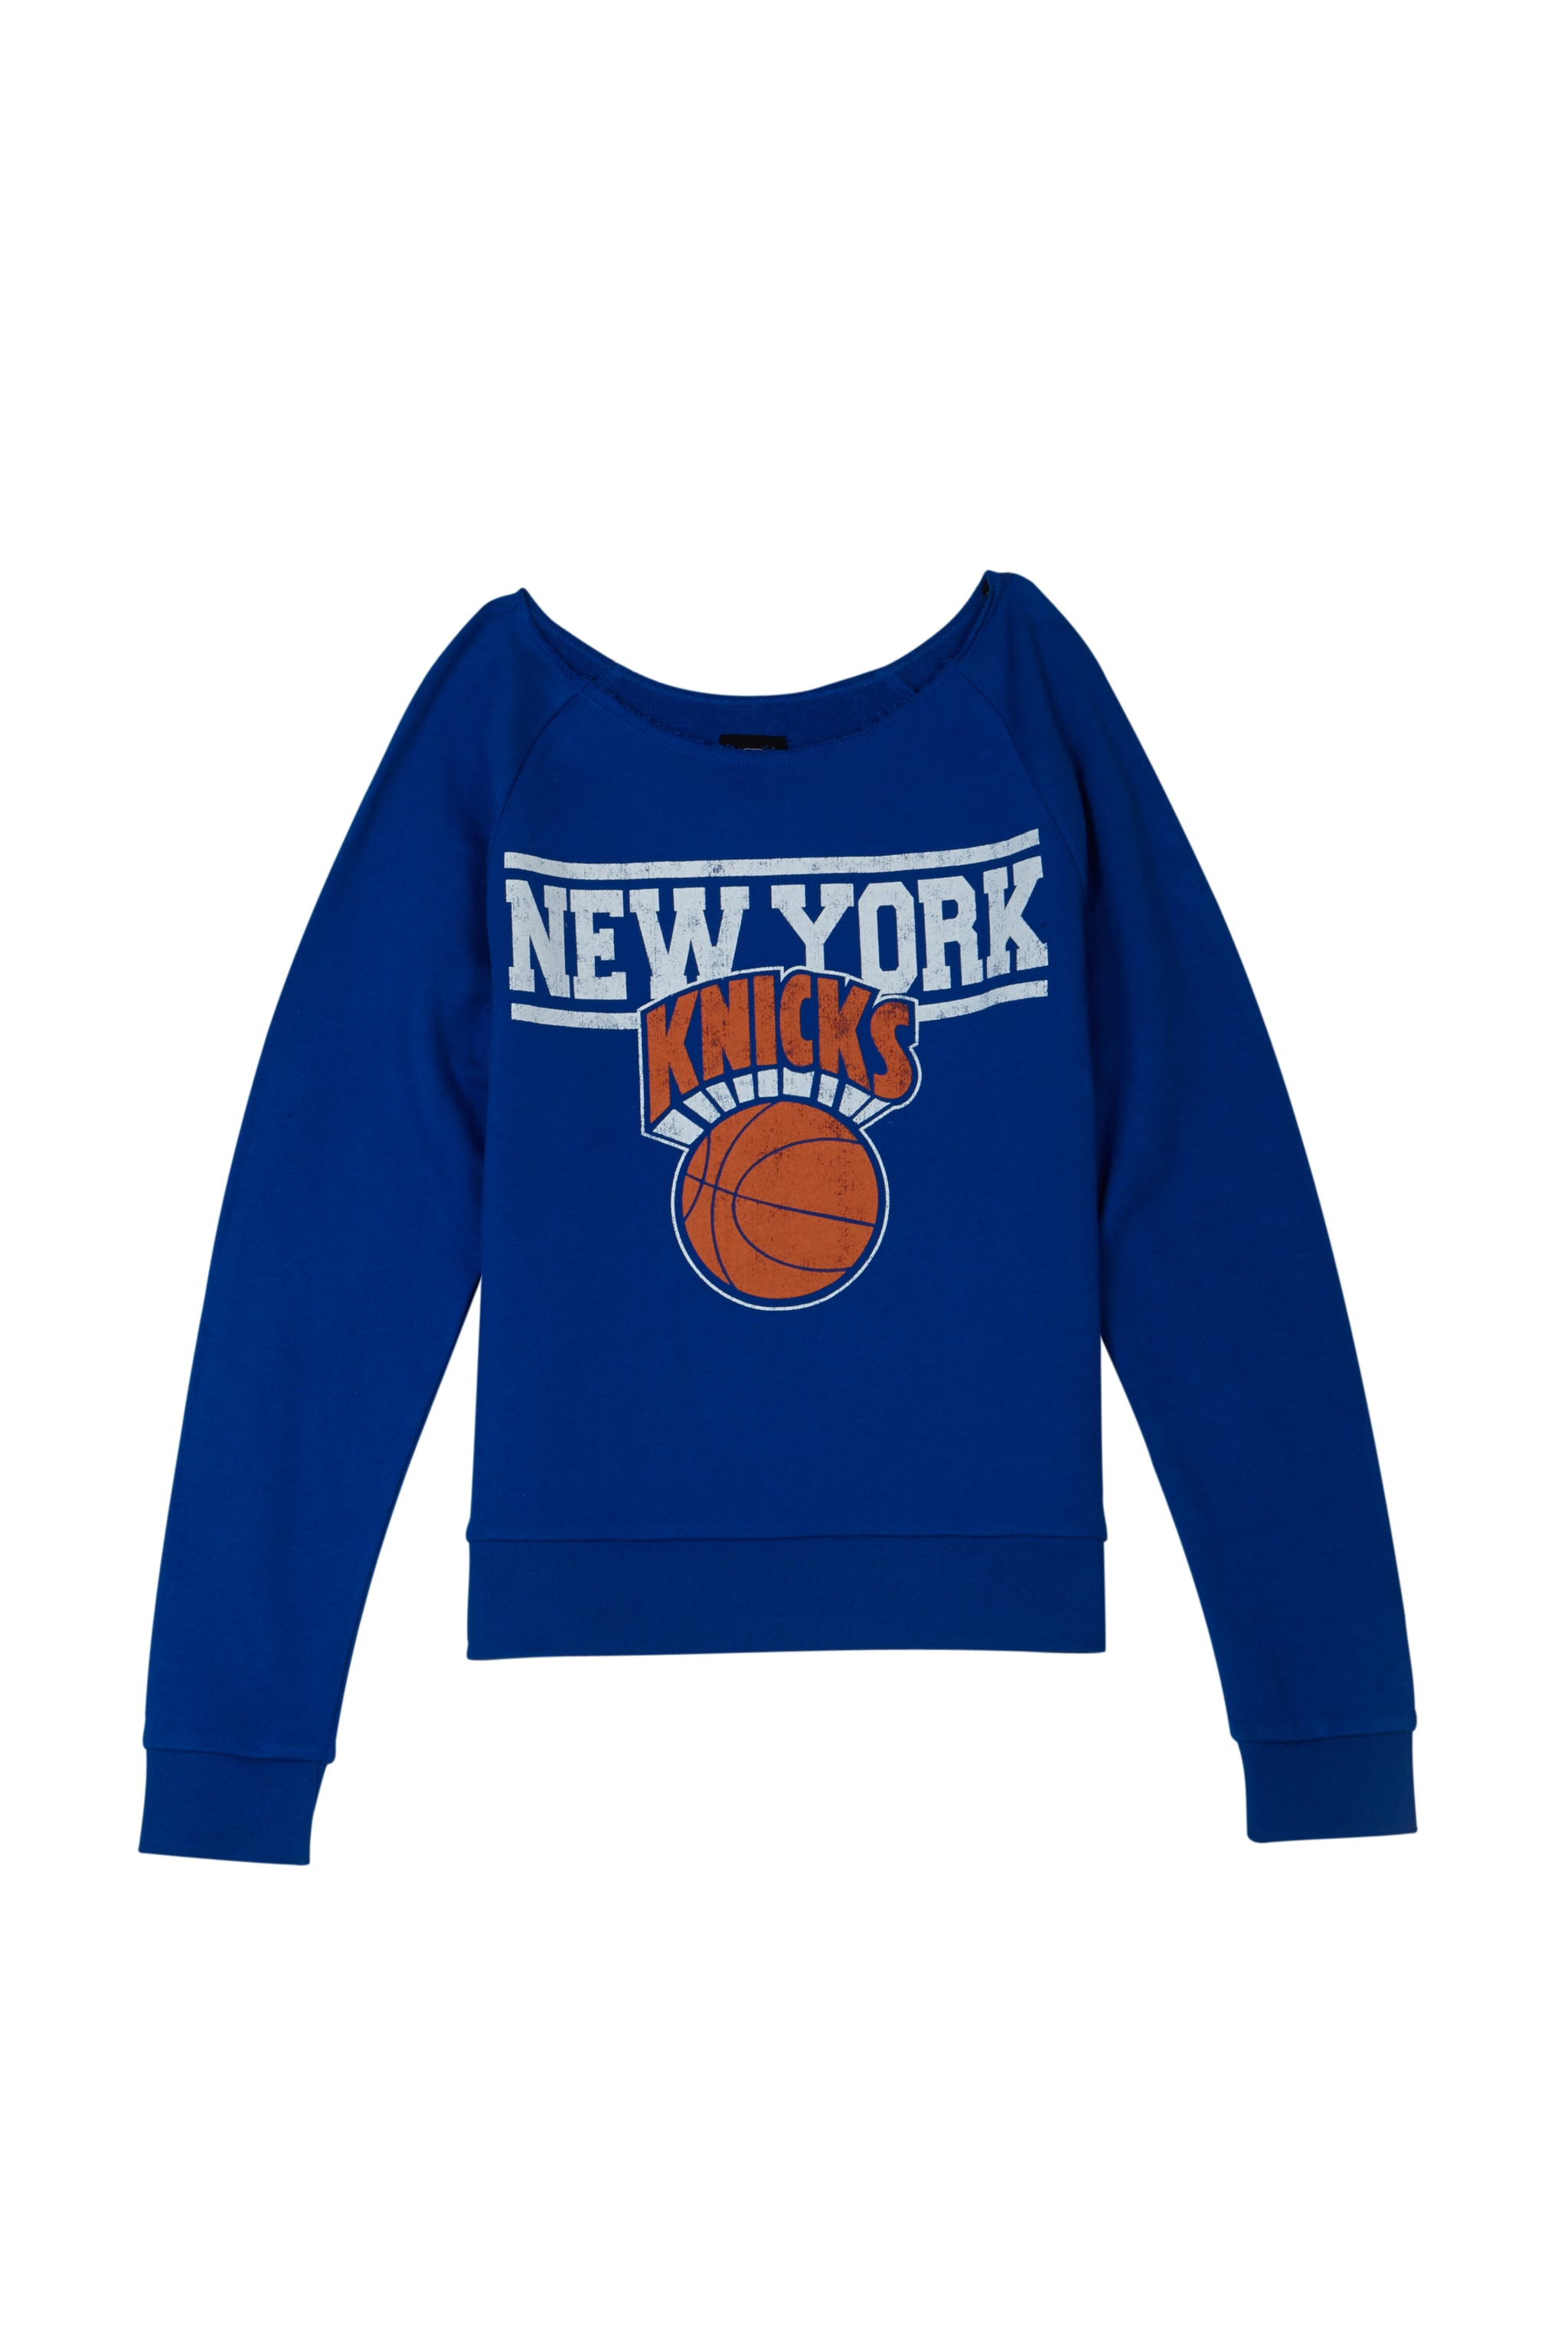 Forever 21 x NBA Knicks Sweatshirt